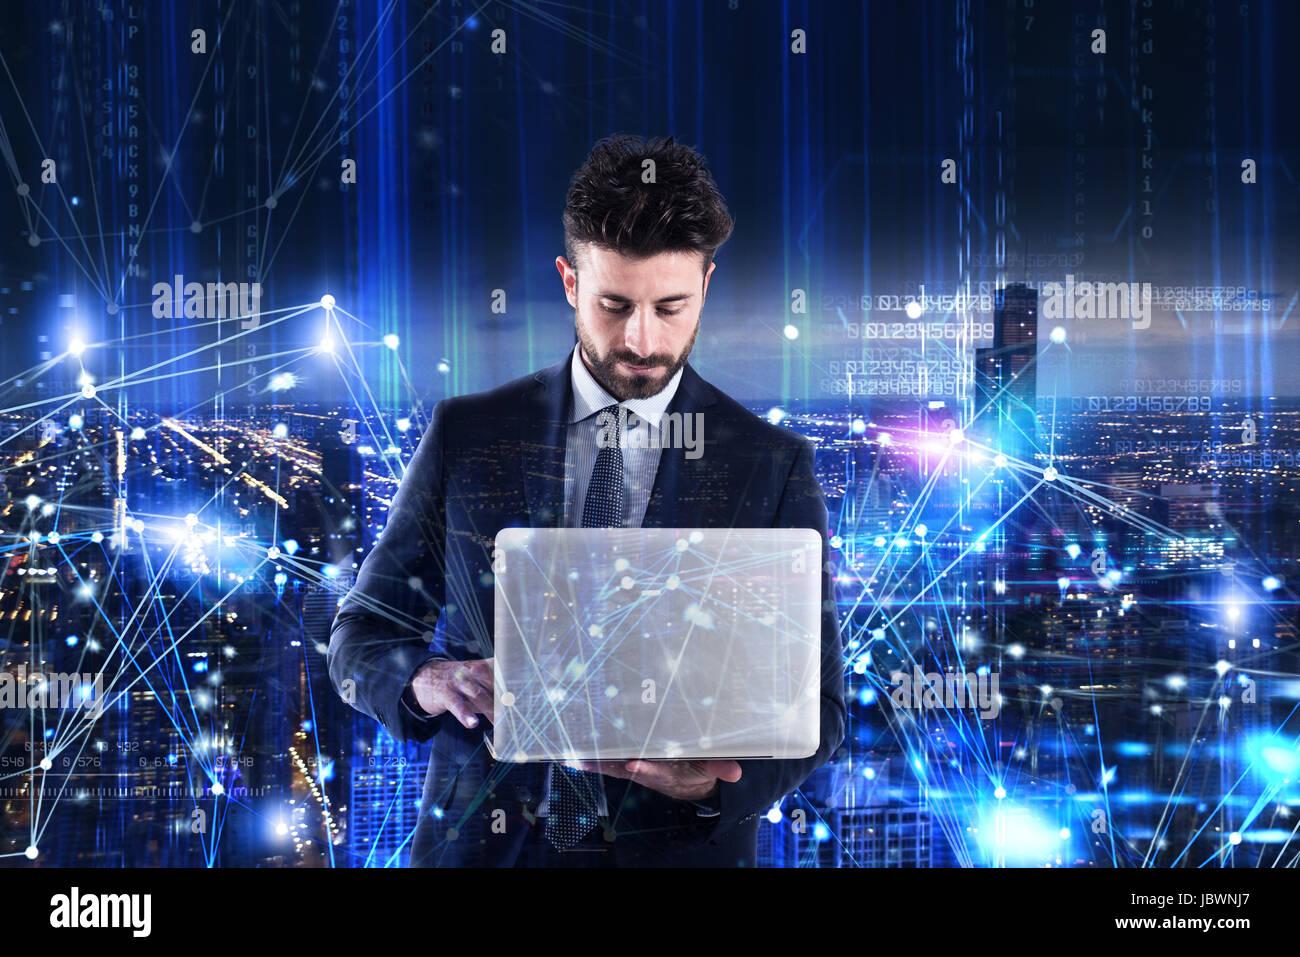 Hombre trabajando con un portátil. Concepto de análisis de software Imagen De Stock